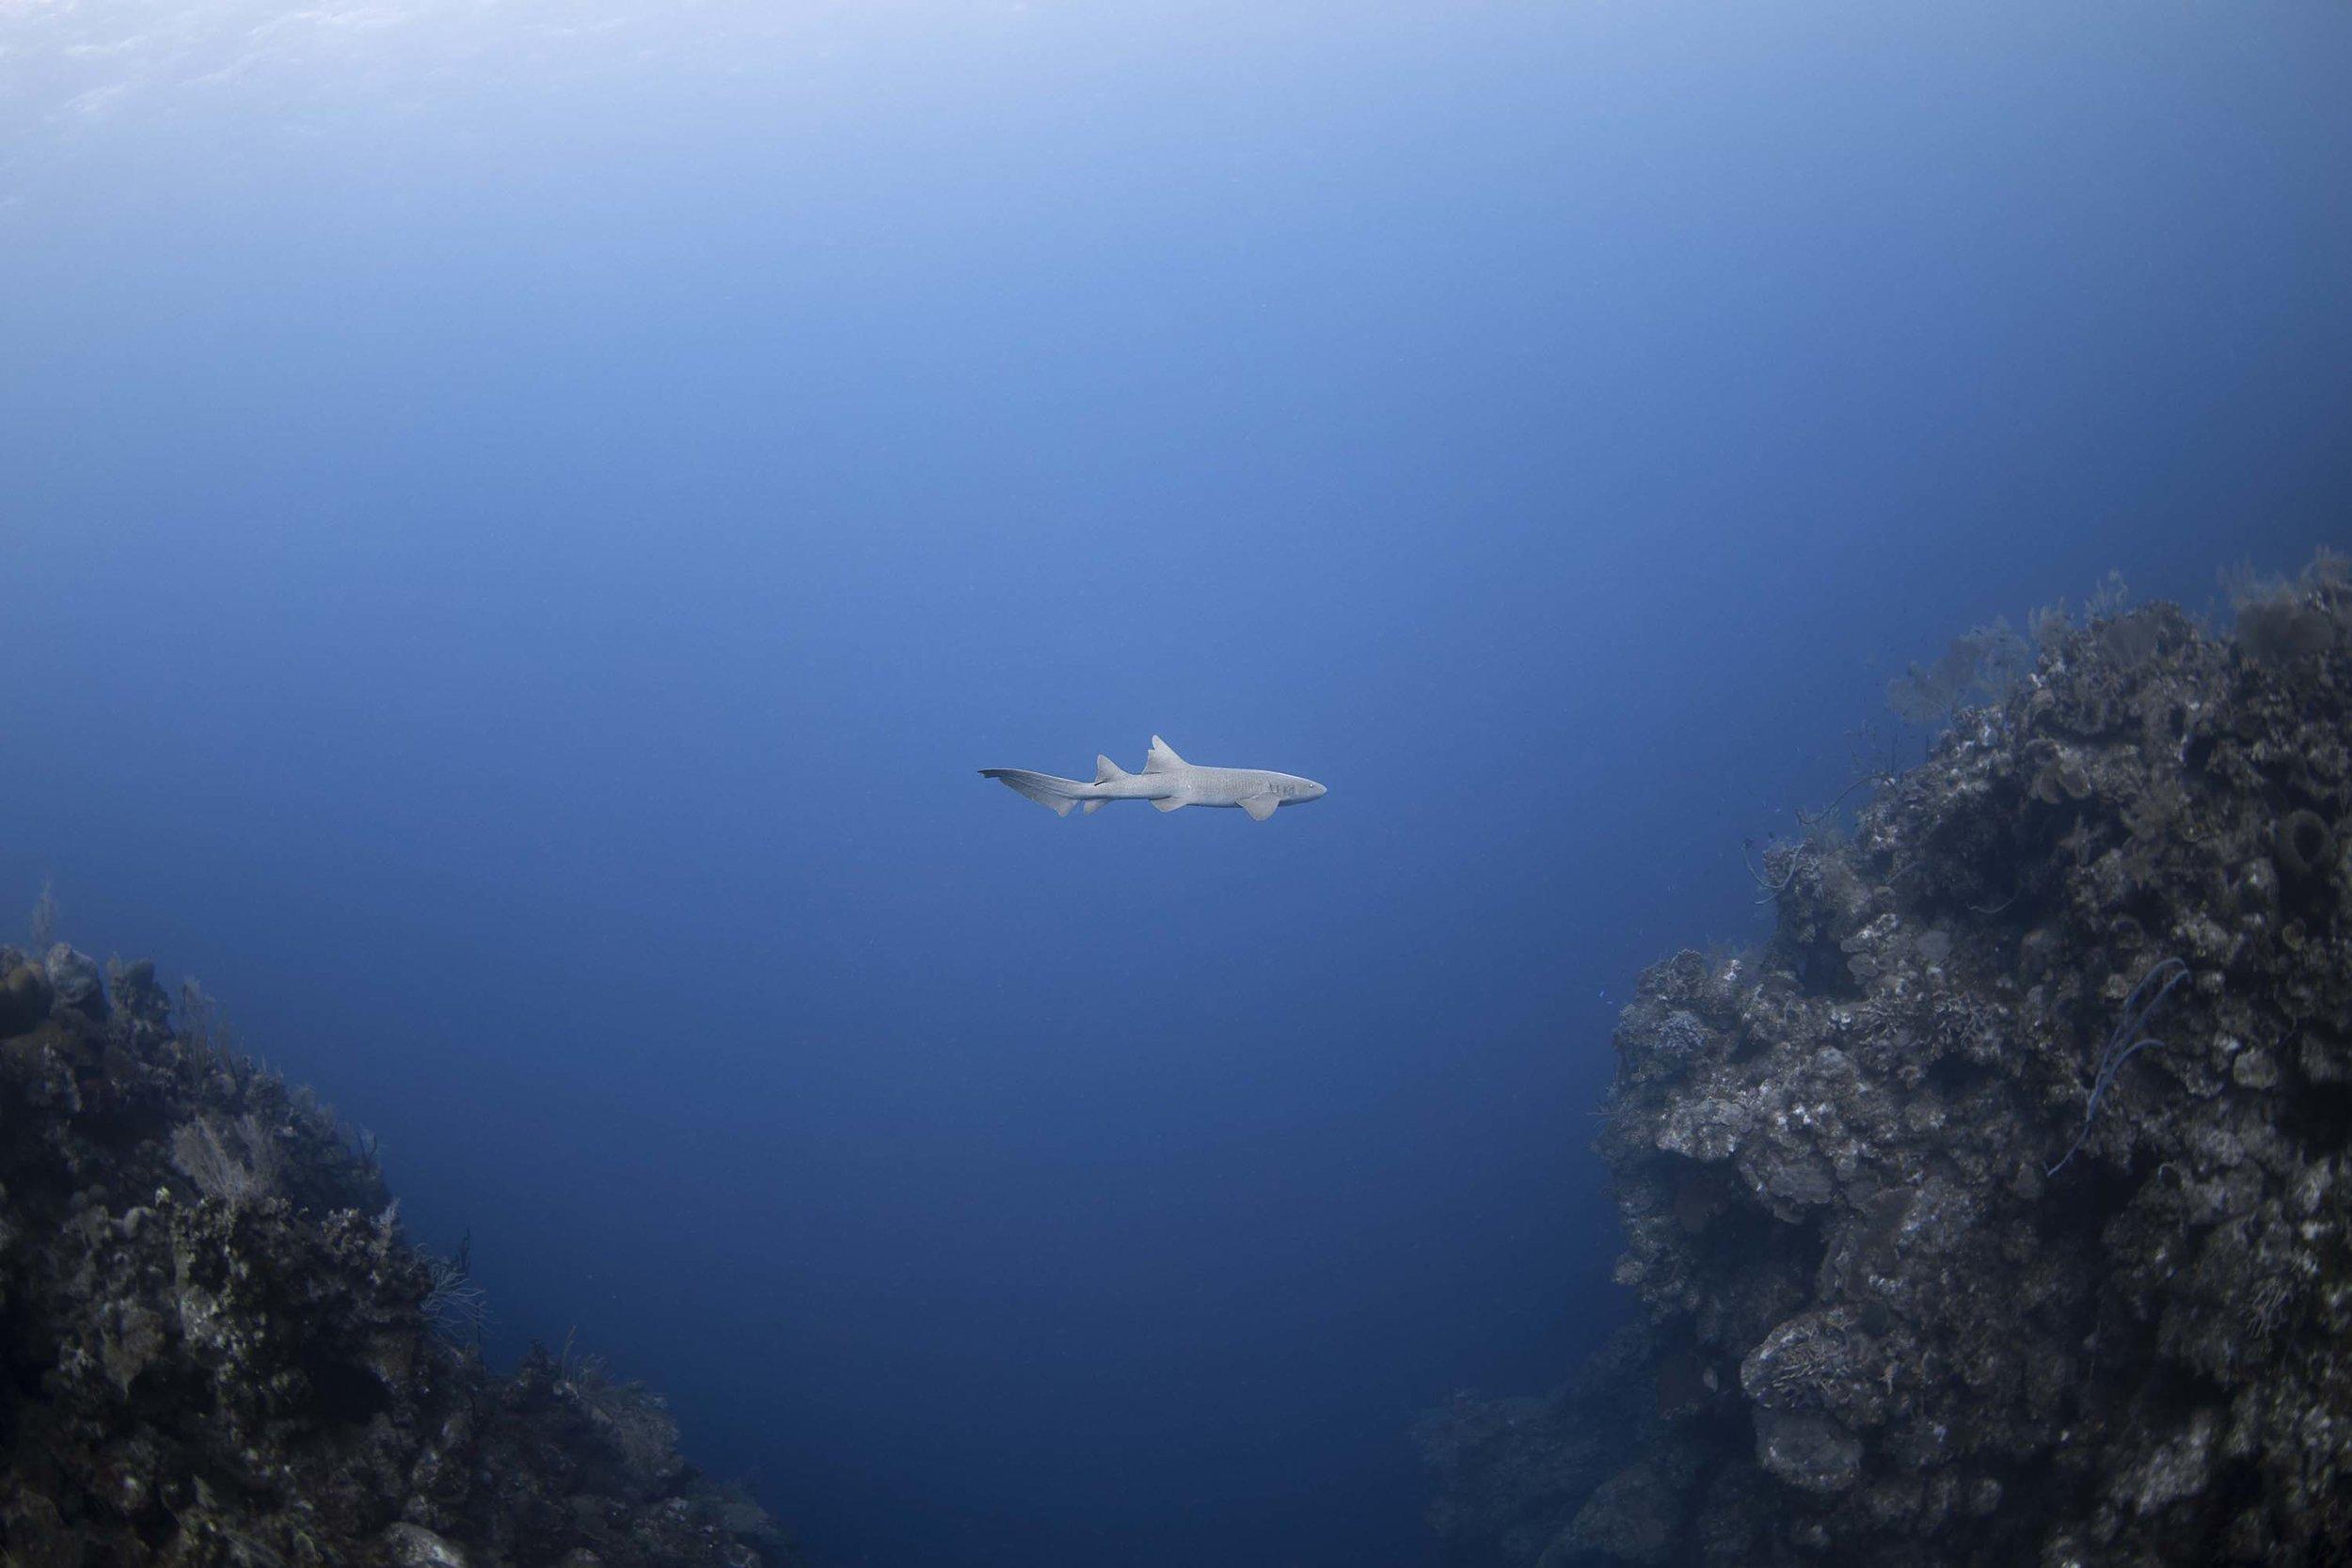 Shark in Cayman Islands Credit: Jason Washington / Coral Reef Image Bank